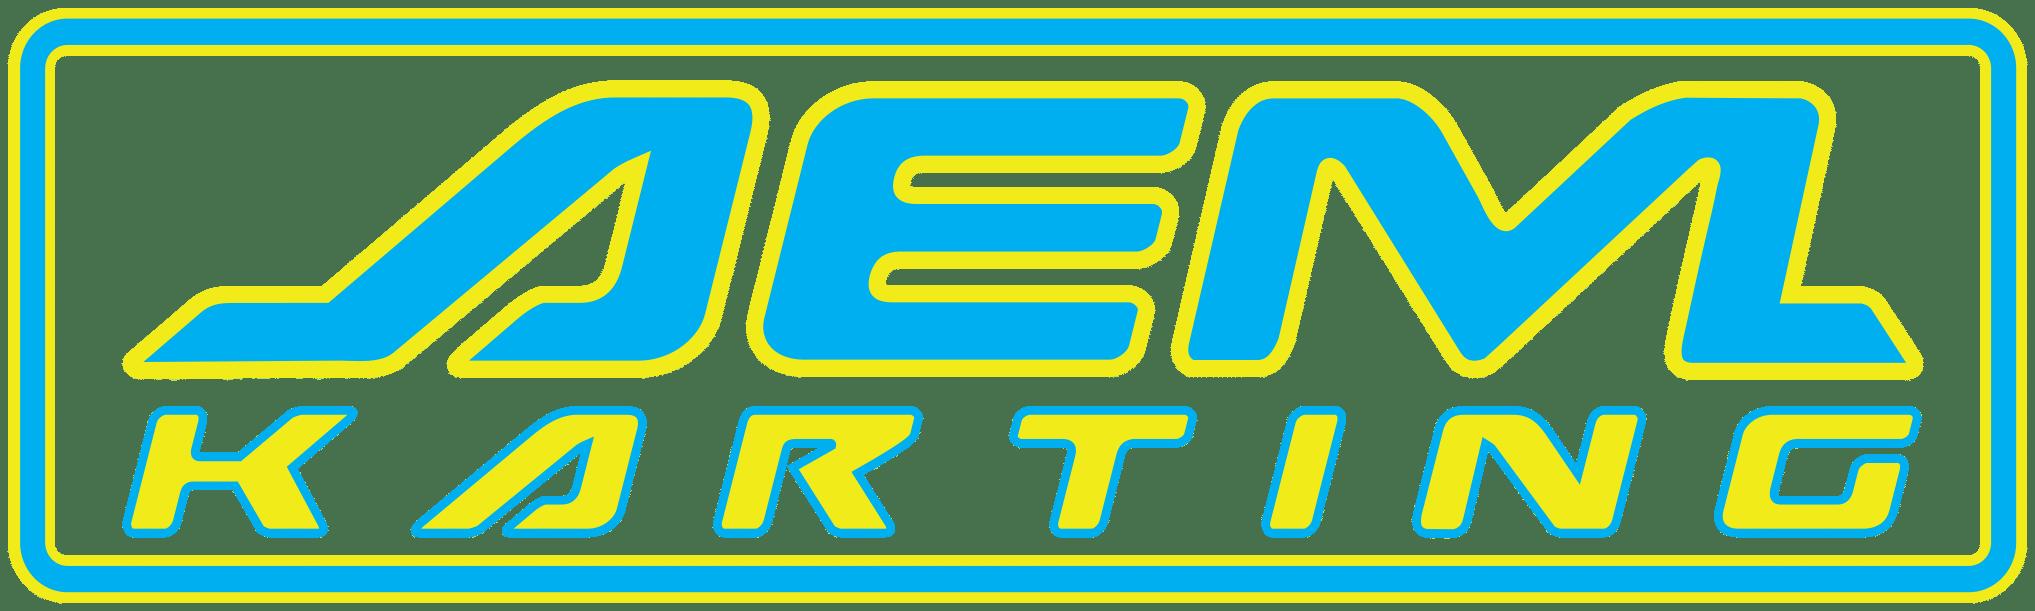 AEM Karting Mick Gabriel Racing